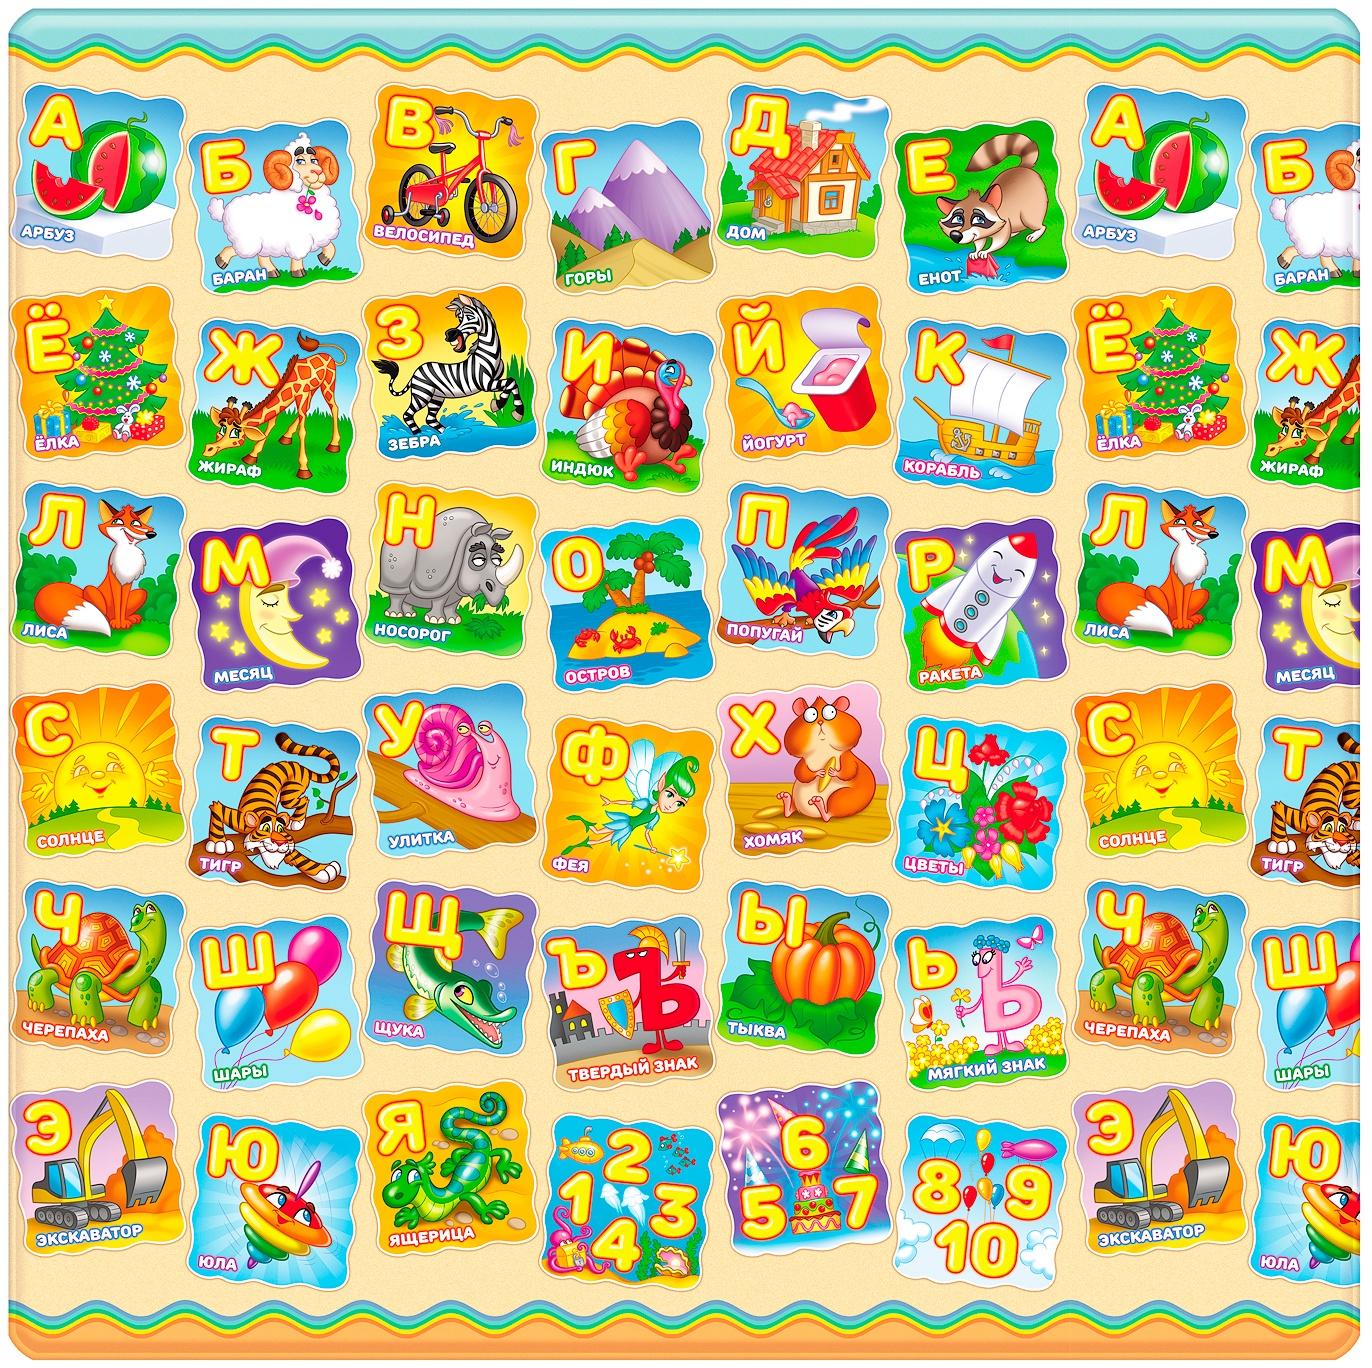 "Funkids / Коврик детский игровой односторонний ""Small-10"" арт. FD-S10-1S-008"